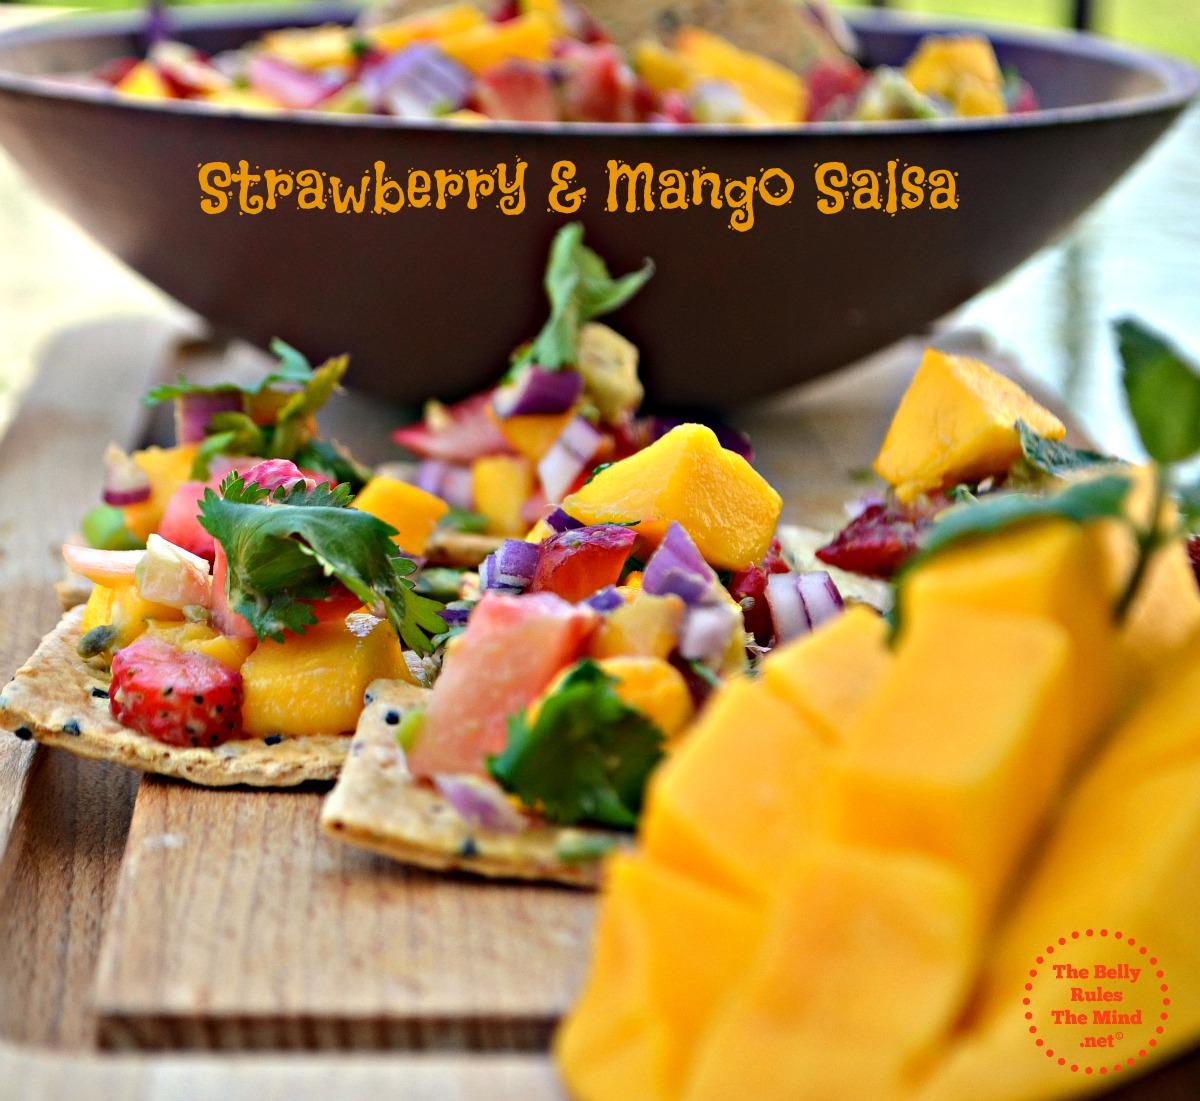 strawberry & mango salsa